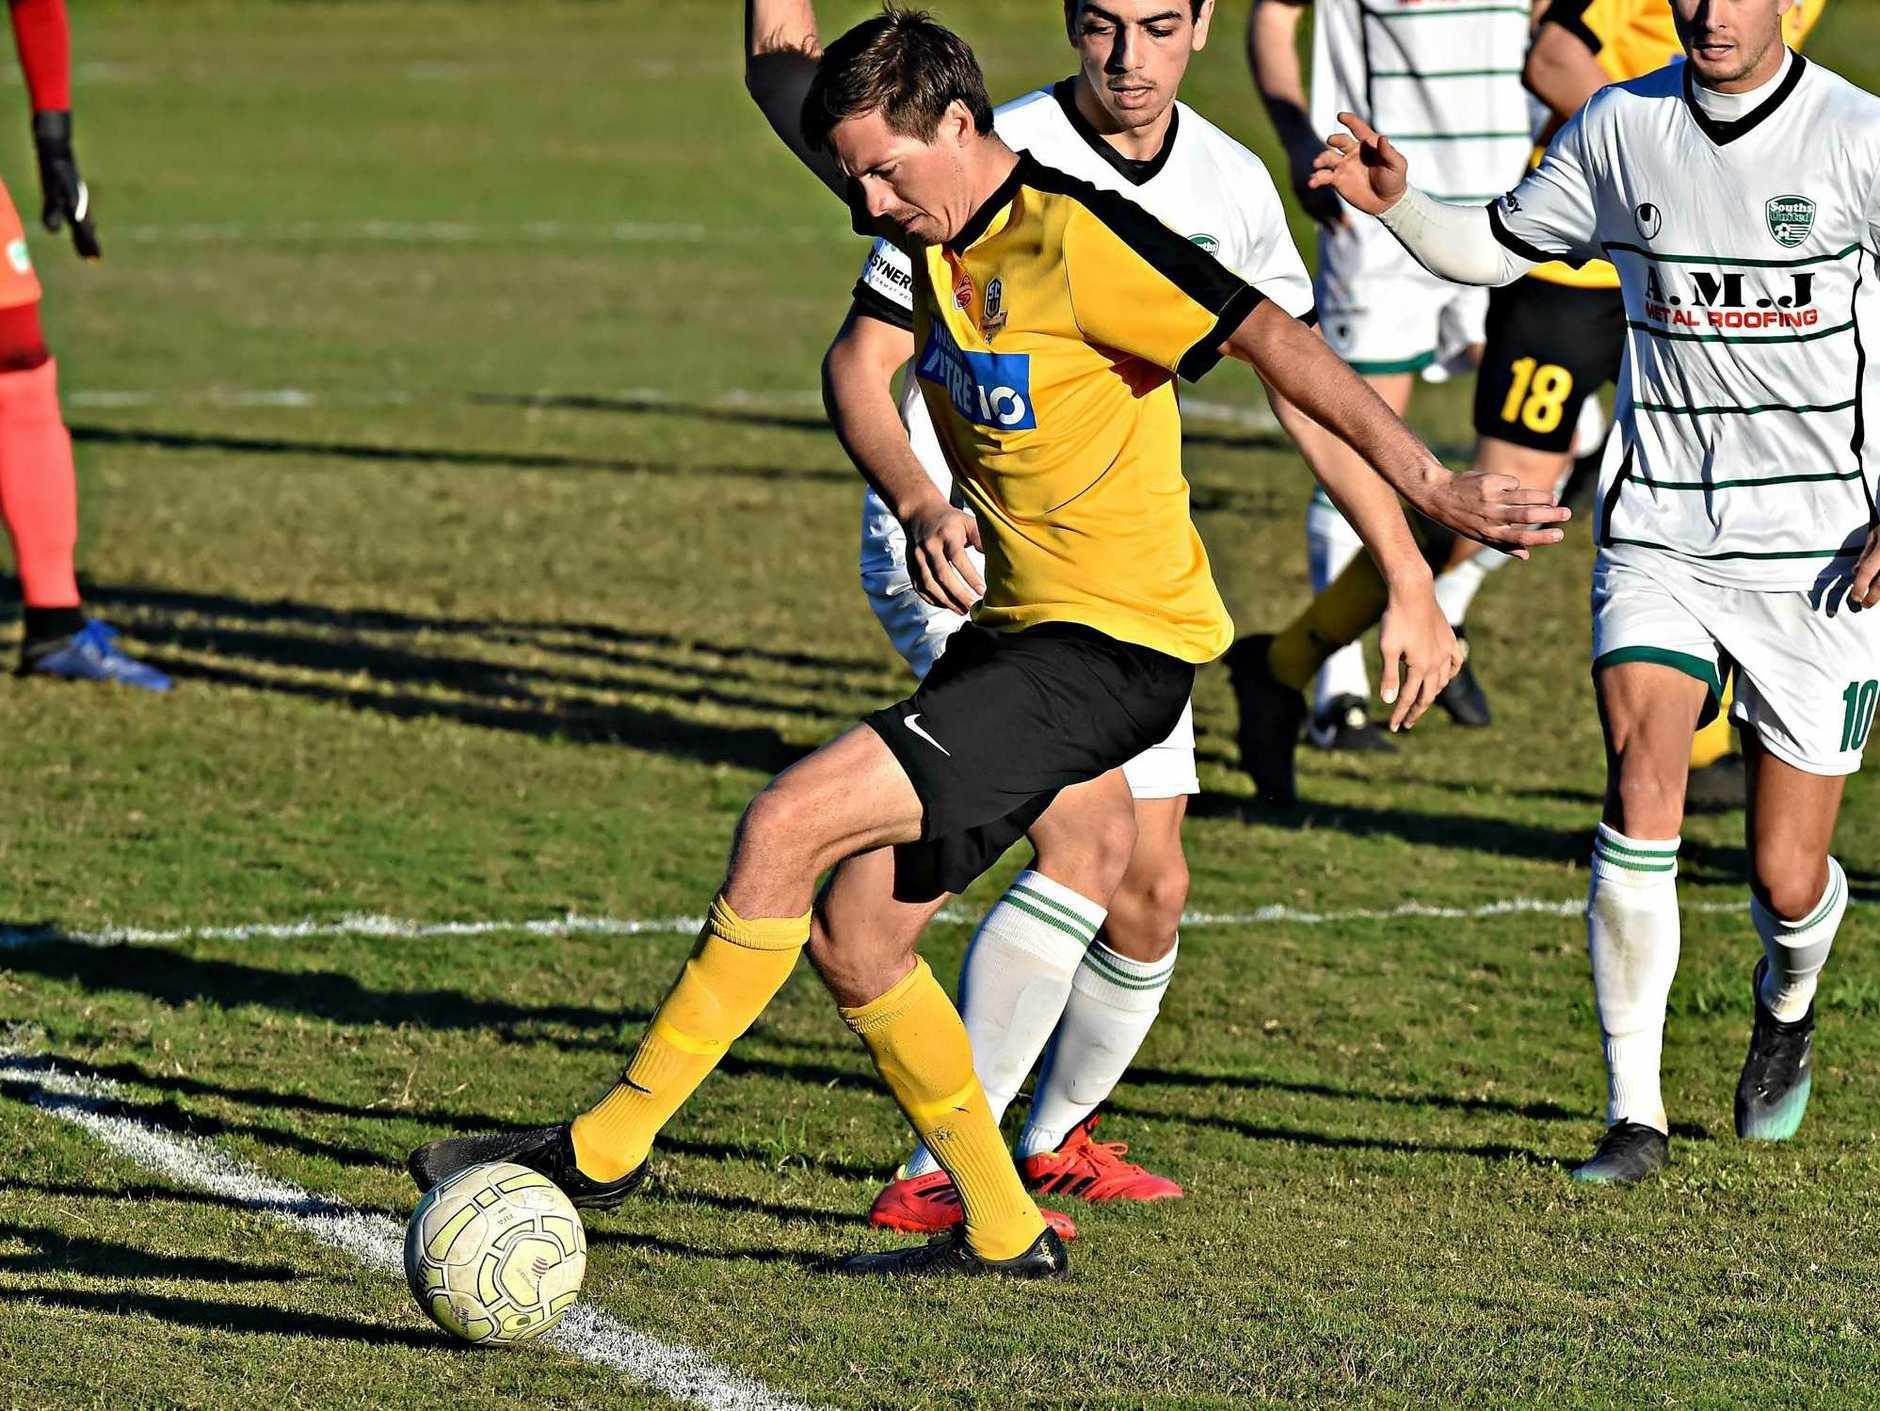 Sunshine Coast Wanderers player Jeremy Stewart on the attack.